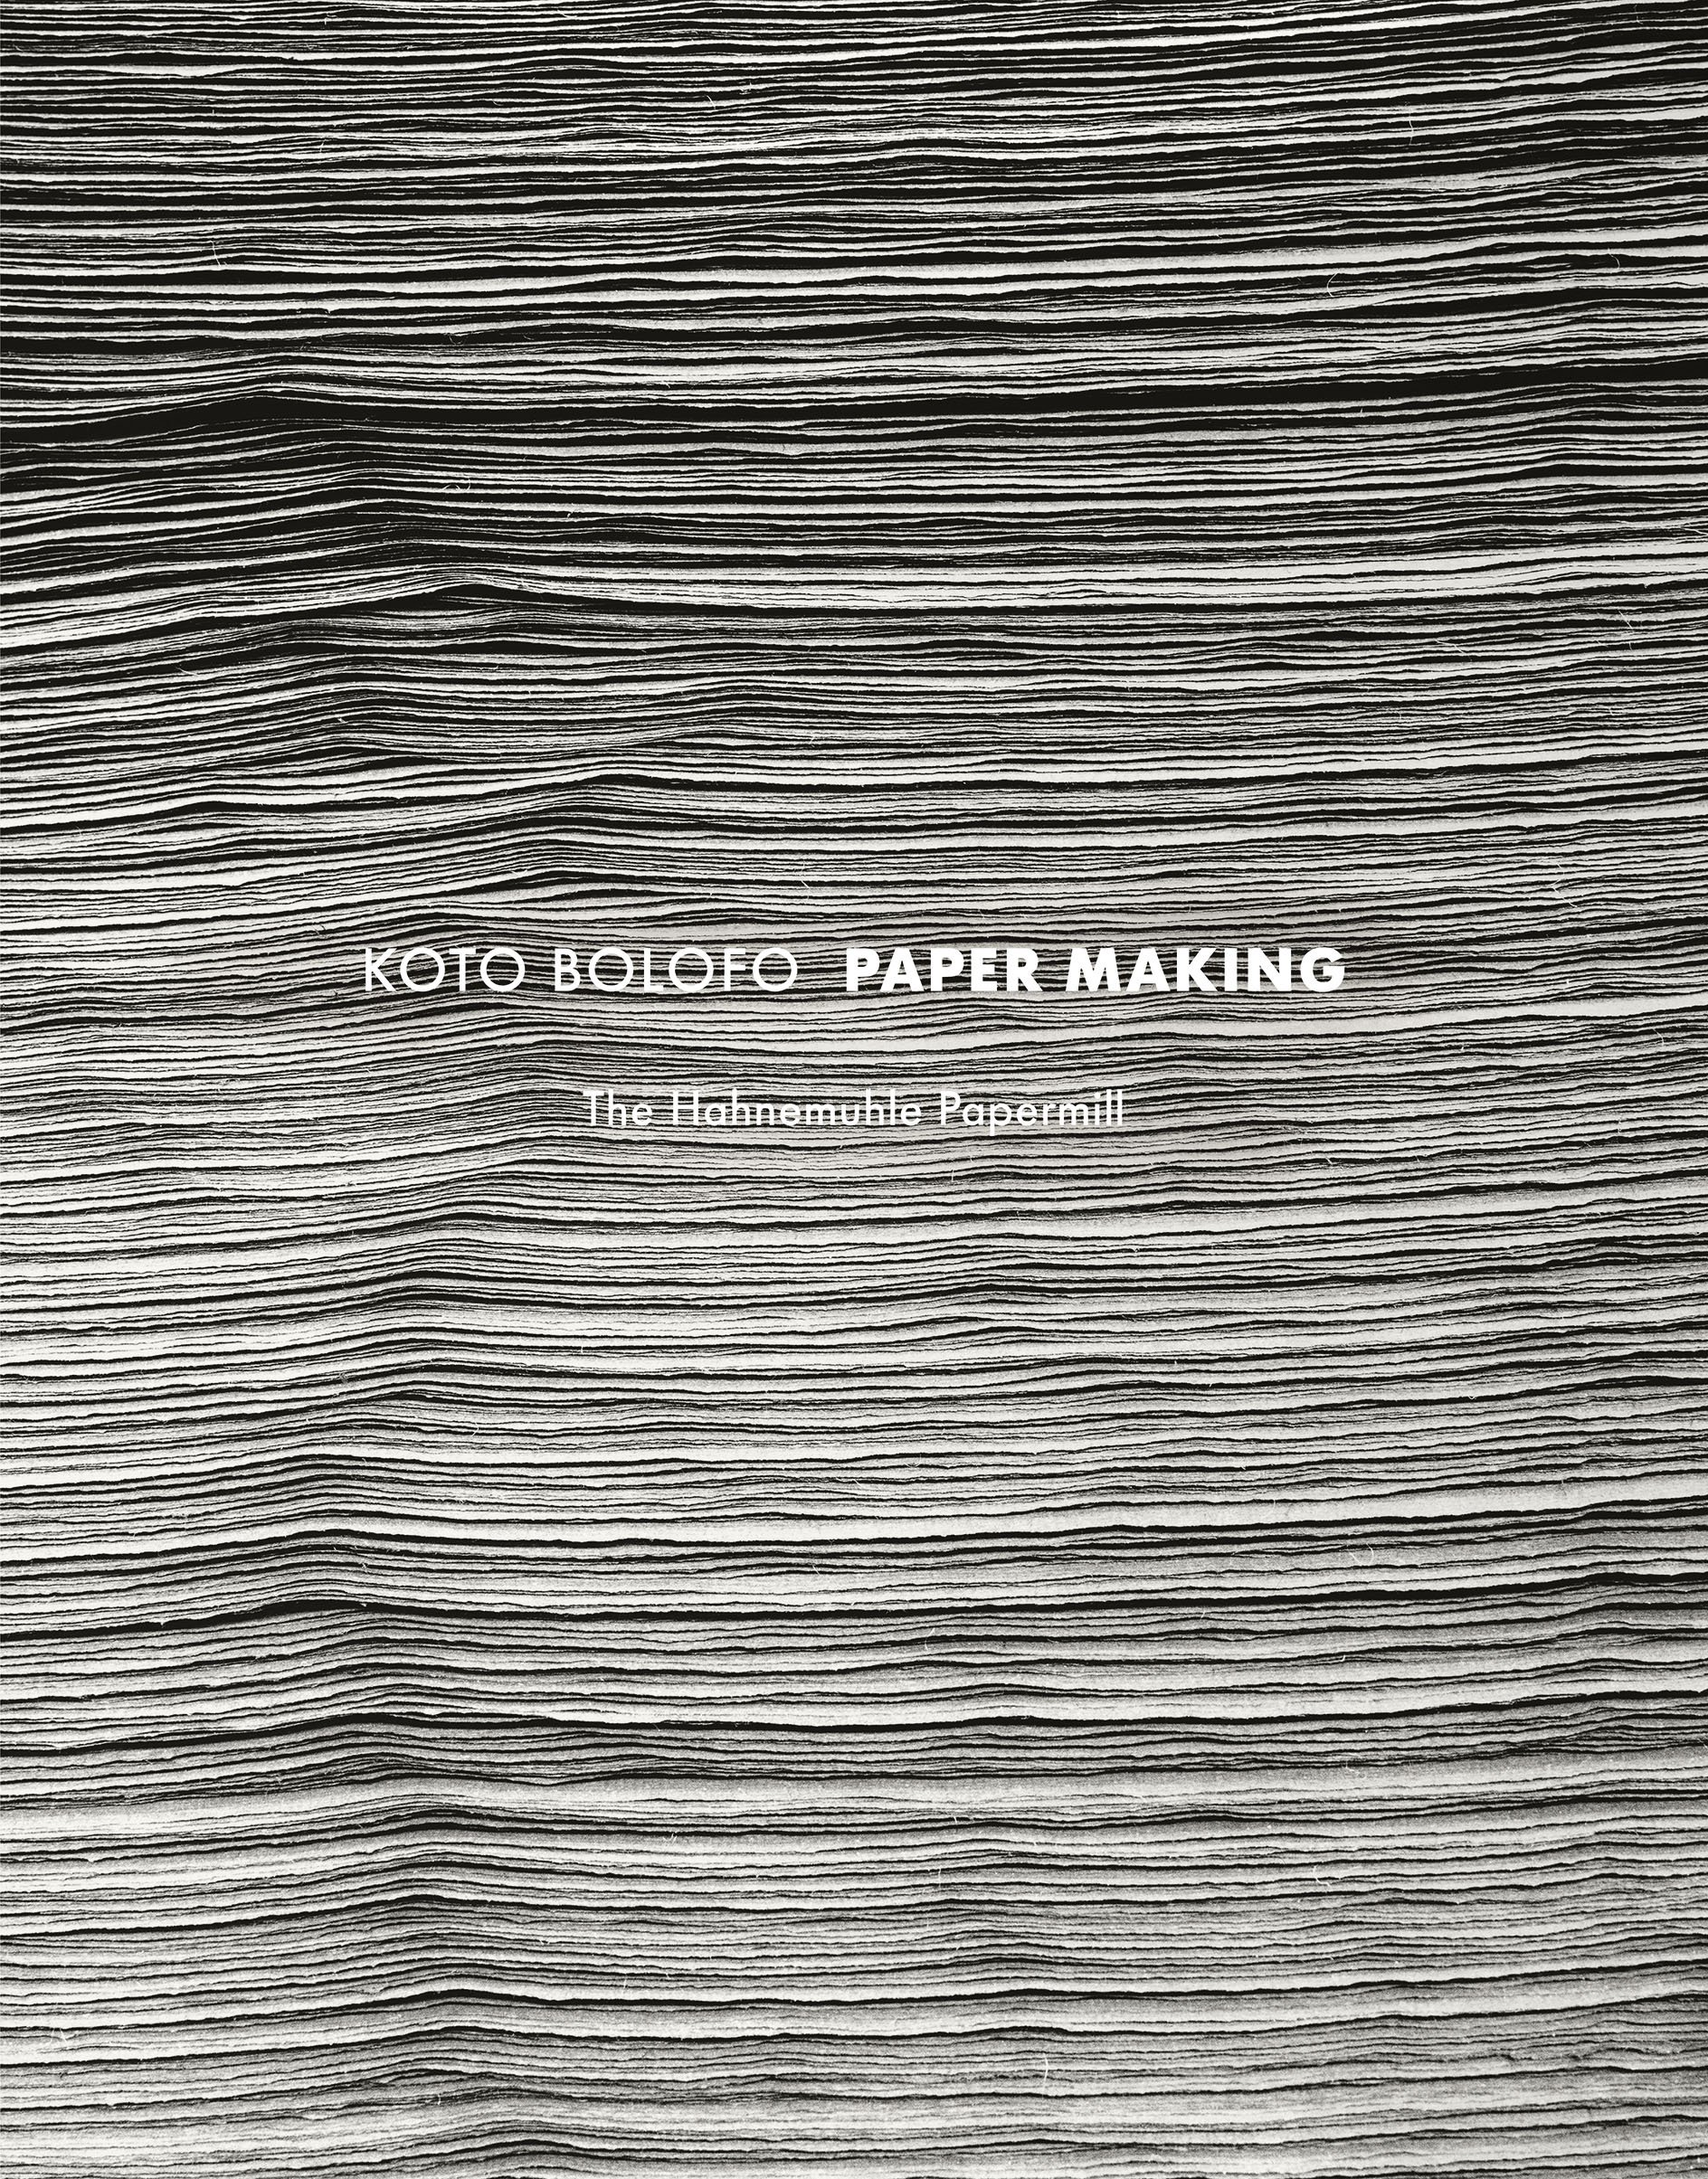 Koto Bolofo: Paper Making